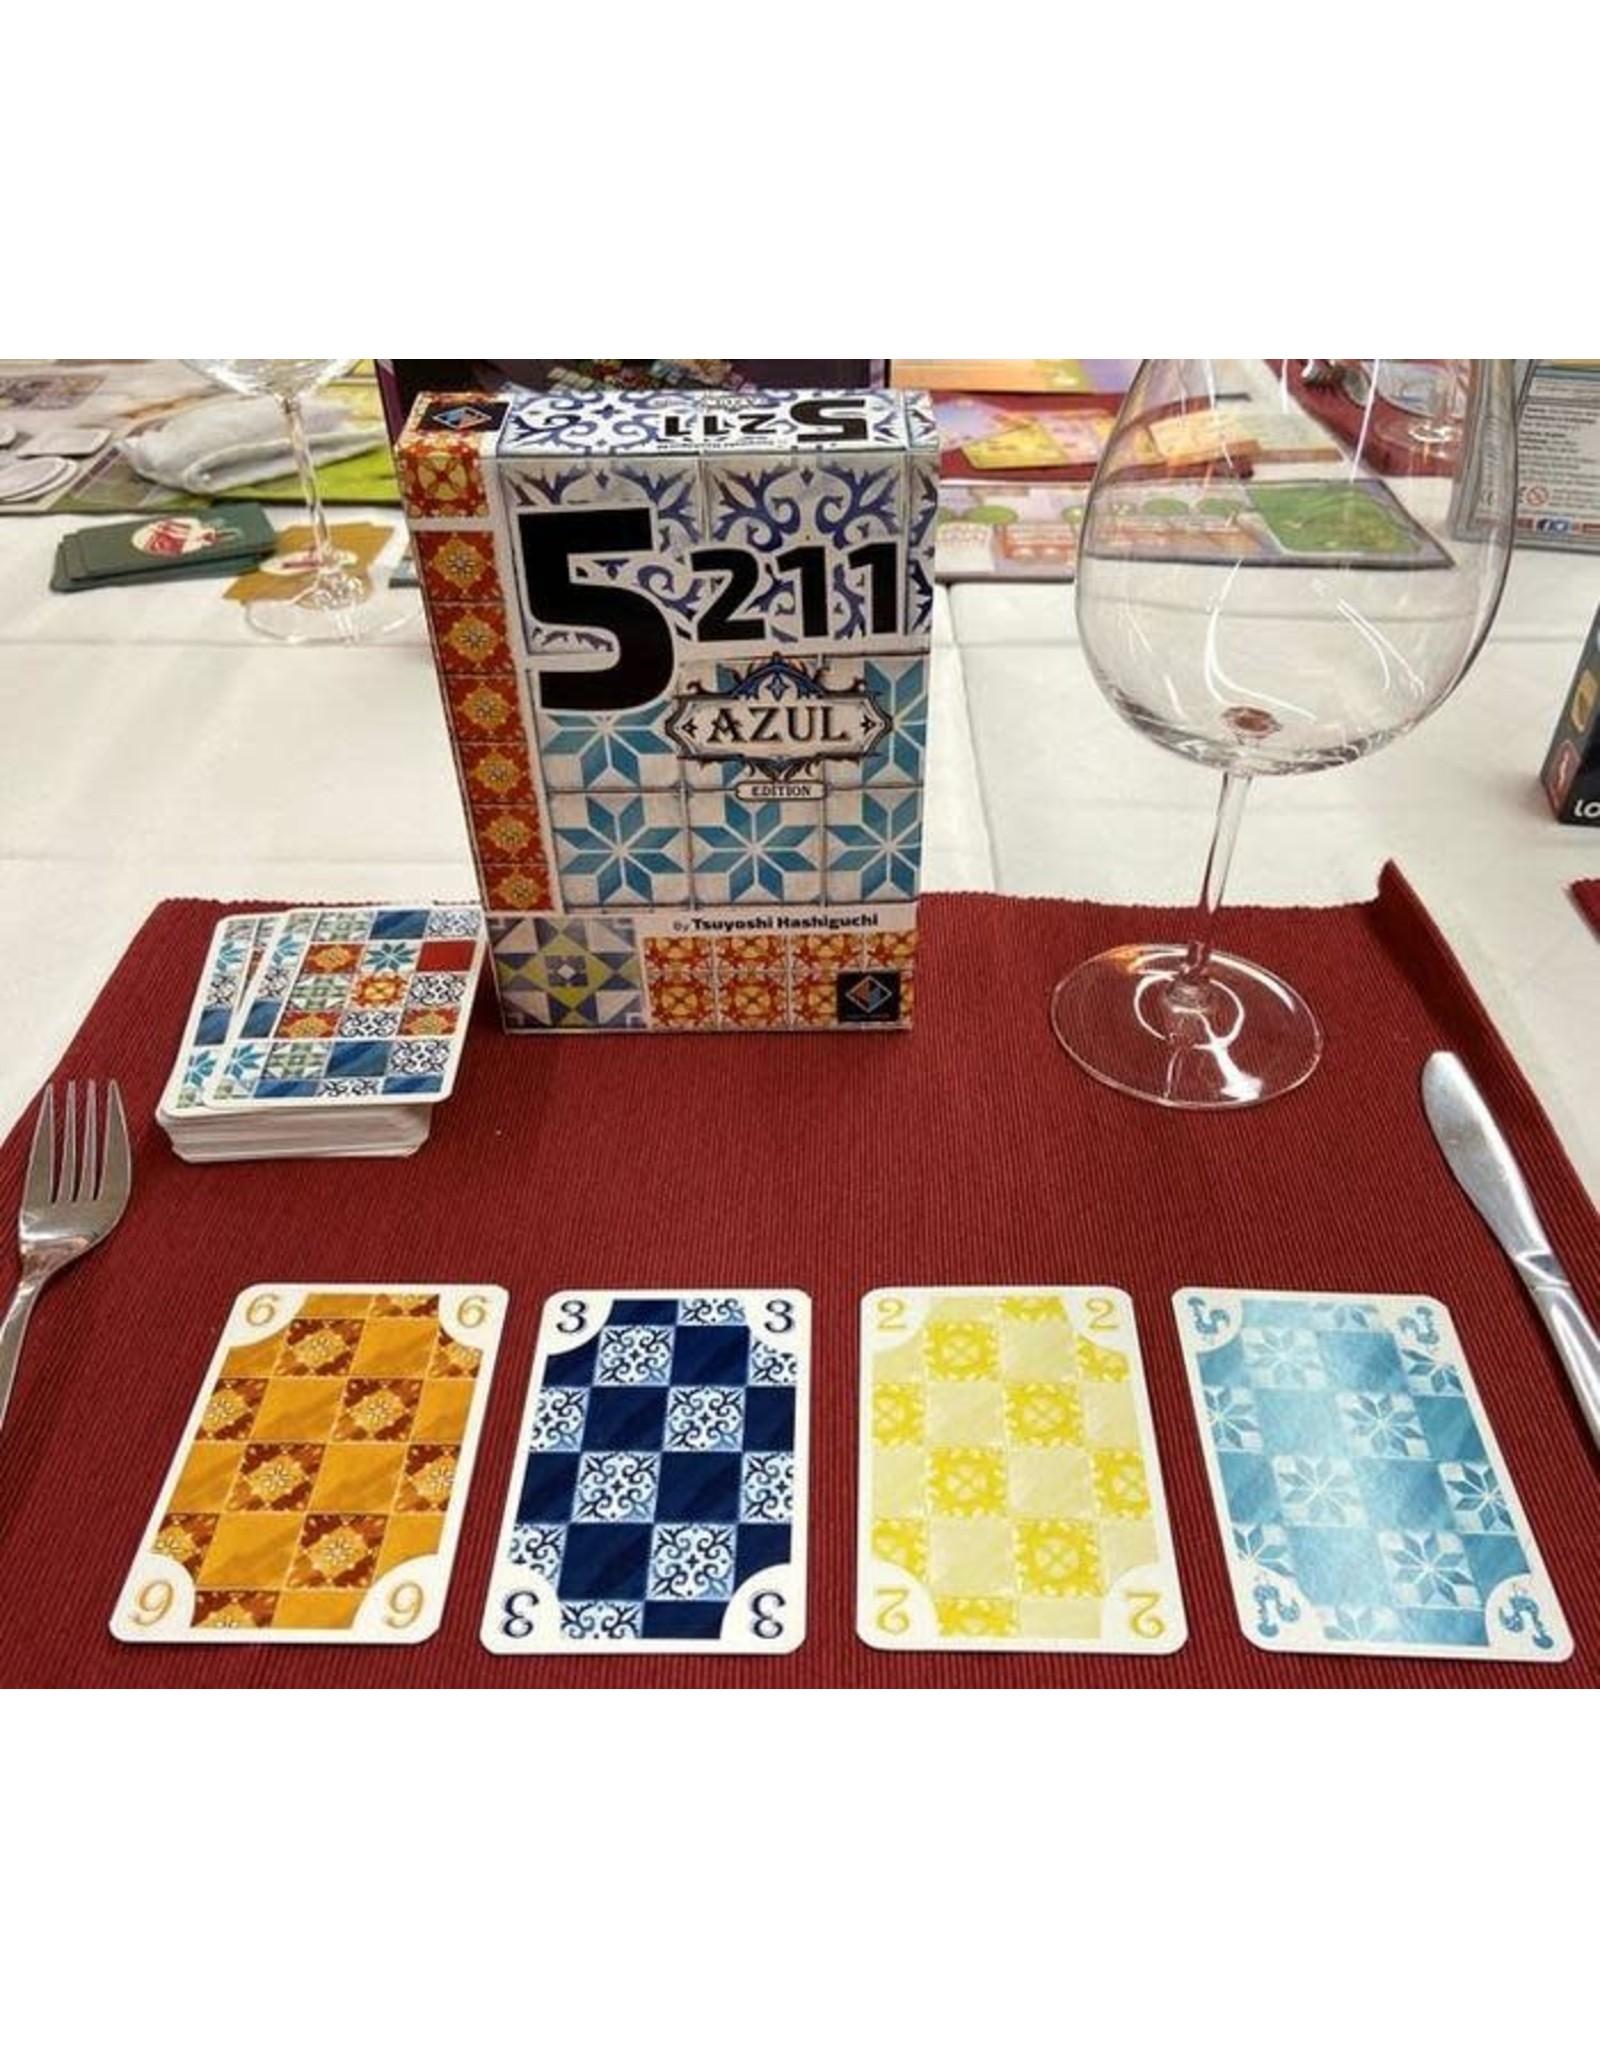 Next Move Games 5211: AZUL EDITION (STREET DATE JUNE 2020)